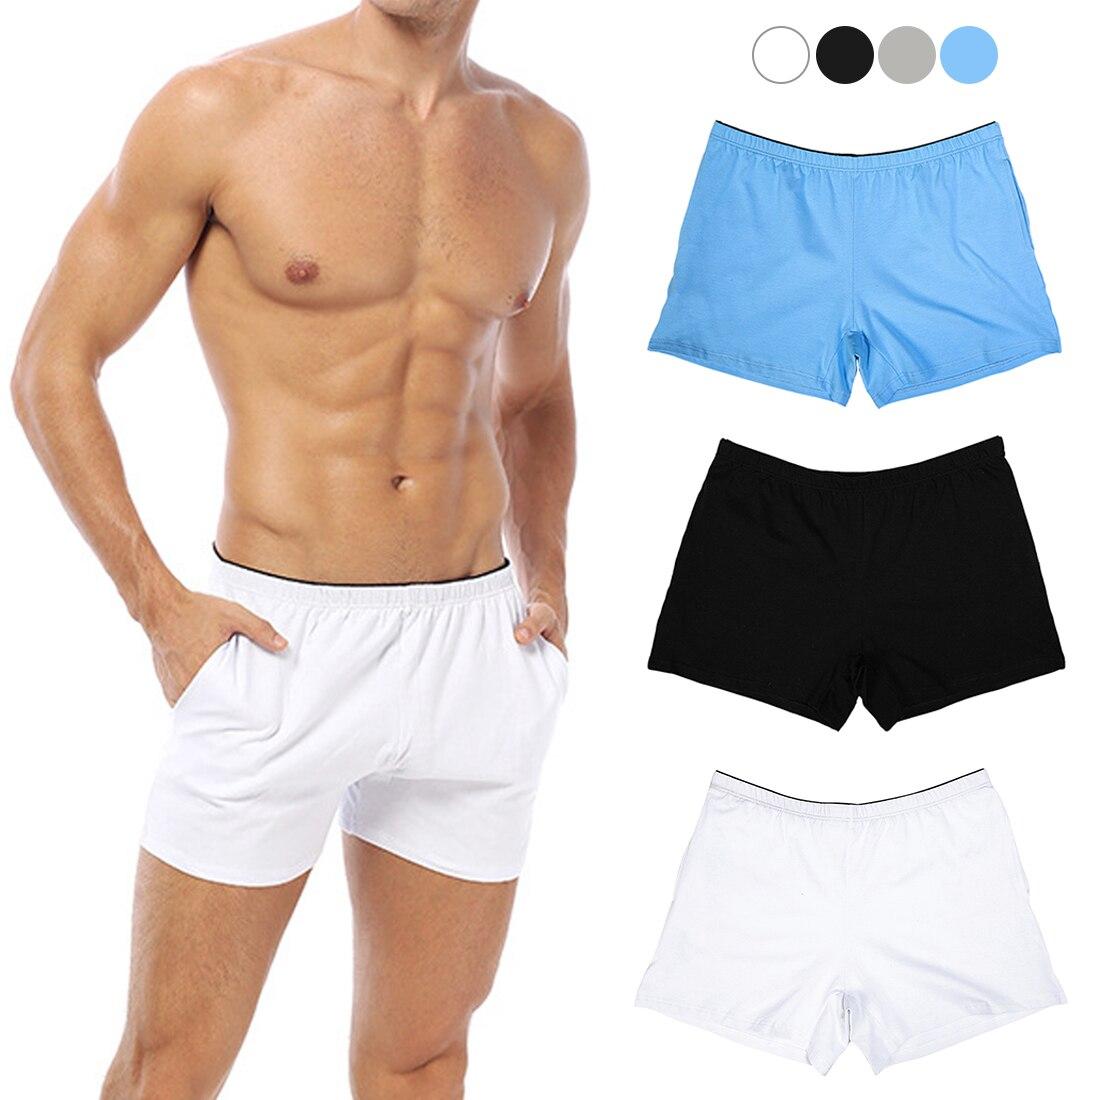 Mens Underwear Boxers Briefs Stretch Ride Unicorn Convex U Bag